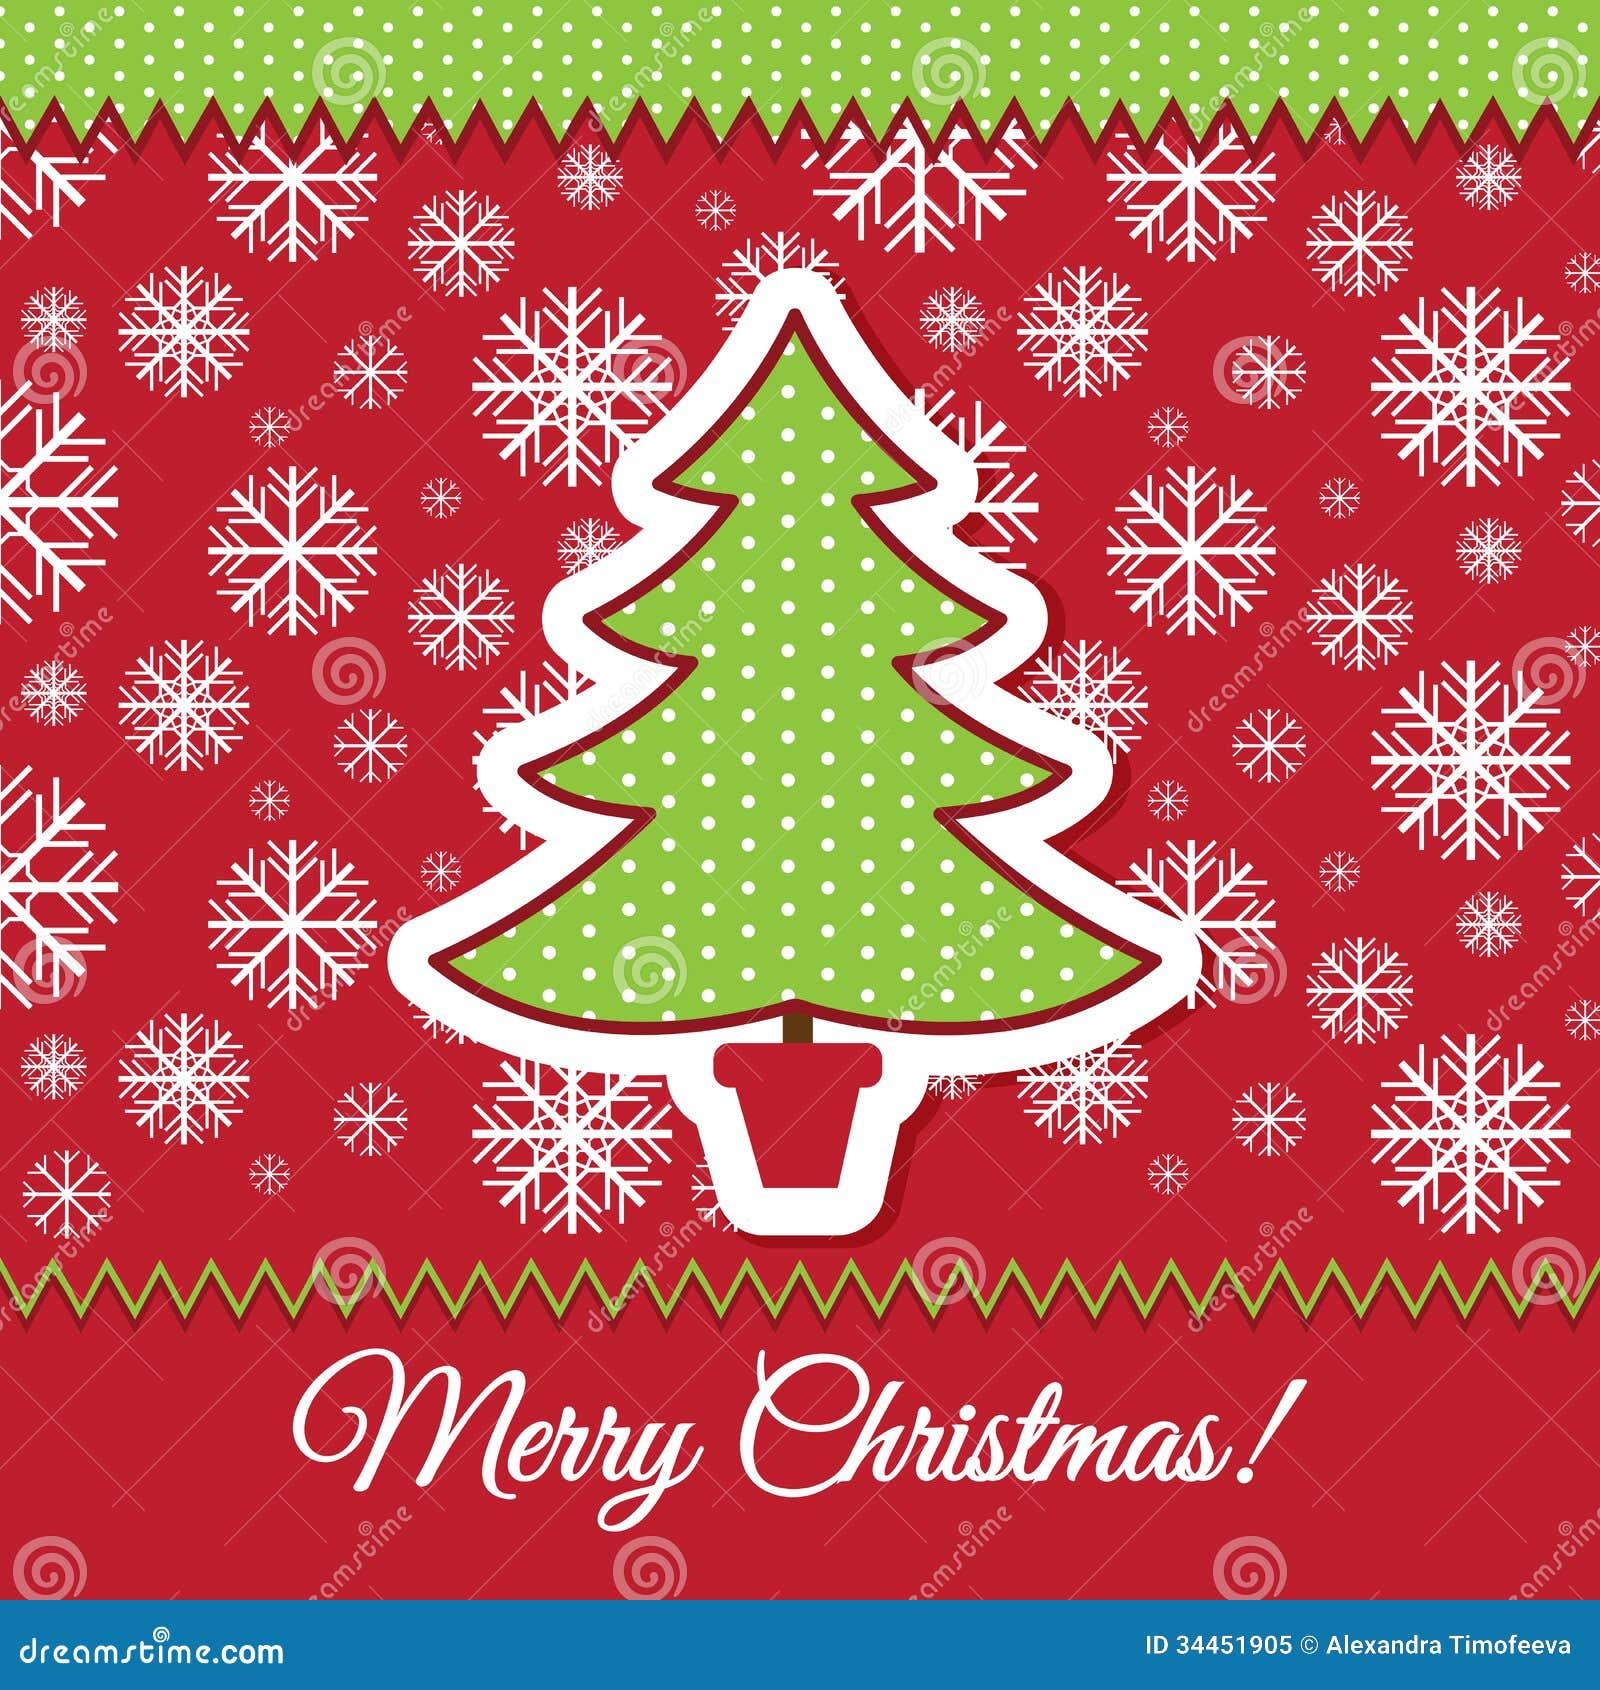 Dise o de la tarjeta de felicitaci n del rbol de navidad - Diseno de arboles de navidad ...